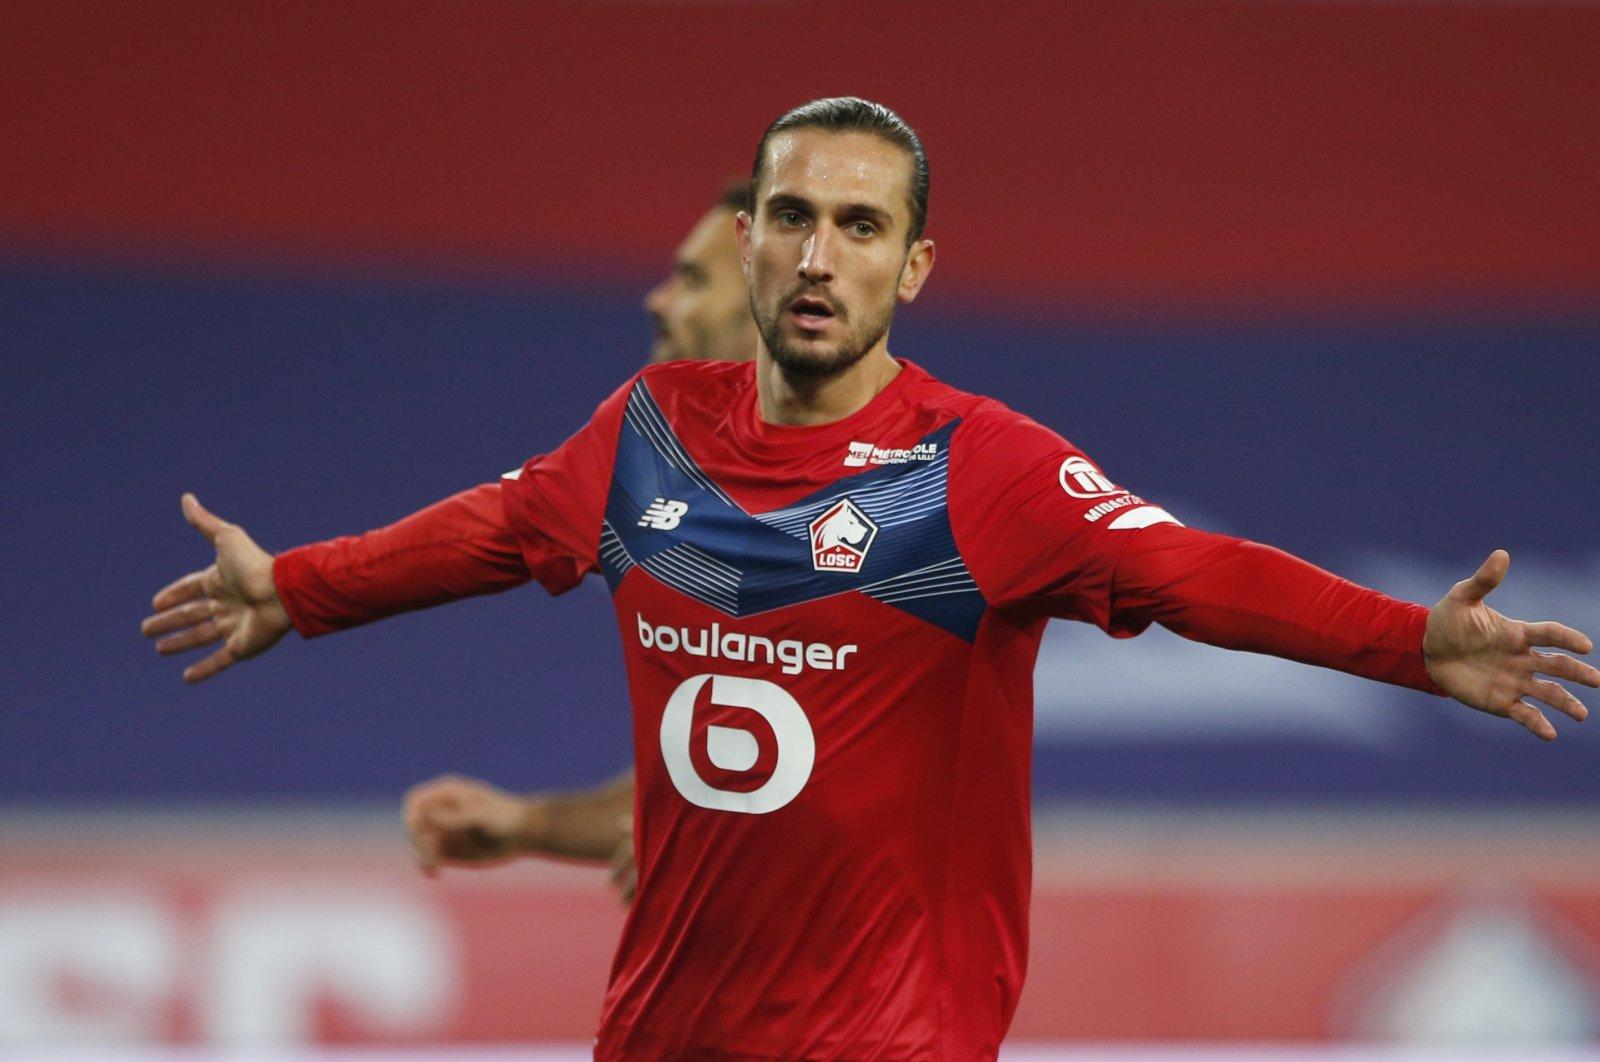 Lille's Yusuf Yazıcı celebrates a goal against Lorient during a Ligue 1 game in Lille, France, Nov. 22, 2020. (Reuters Photo)